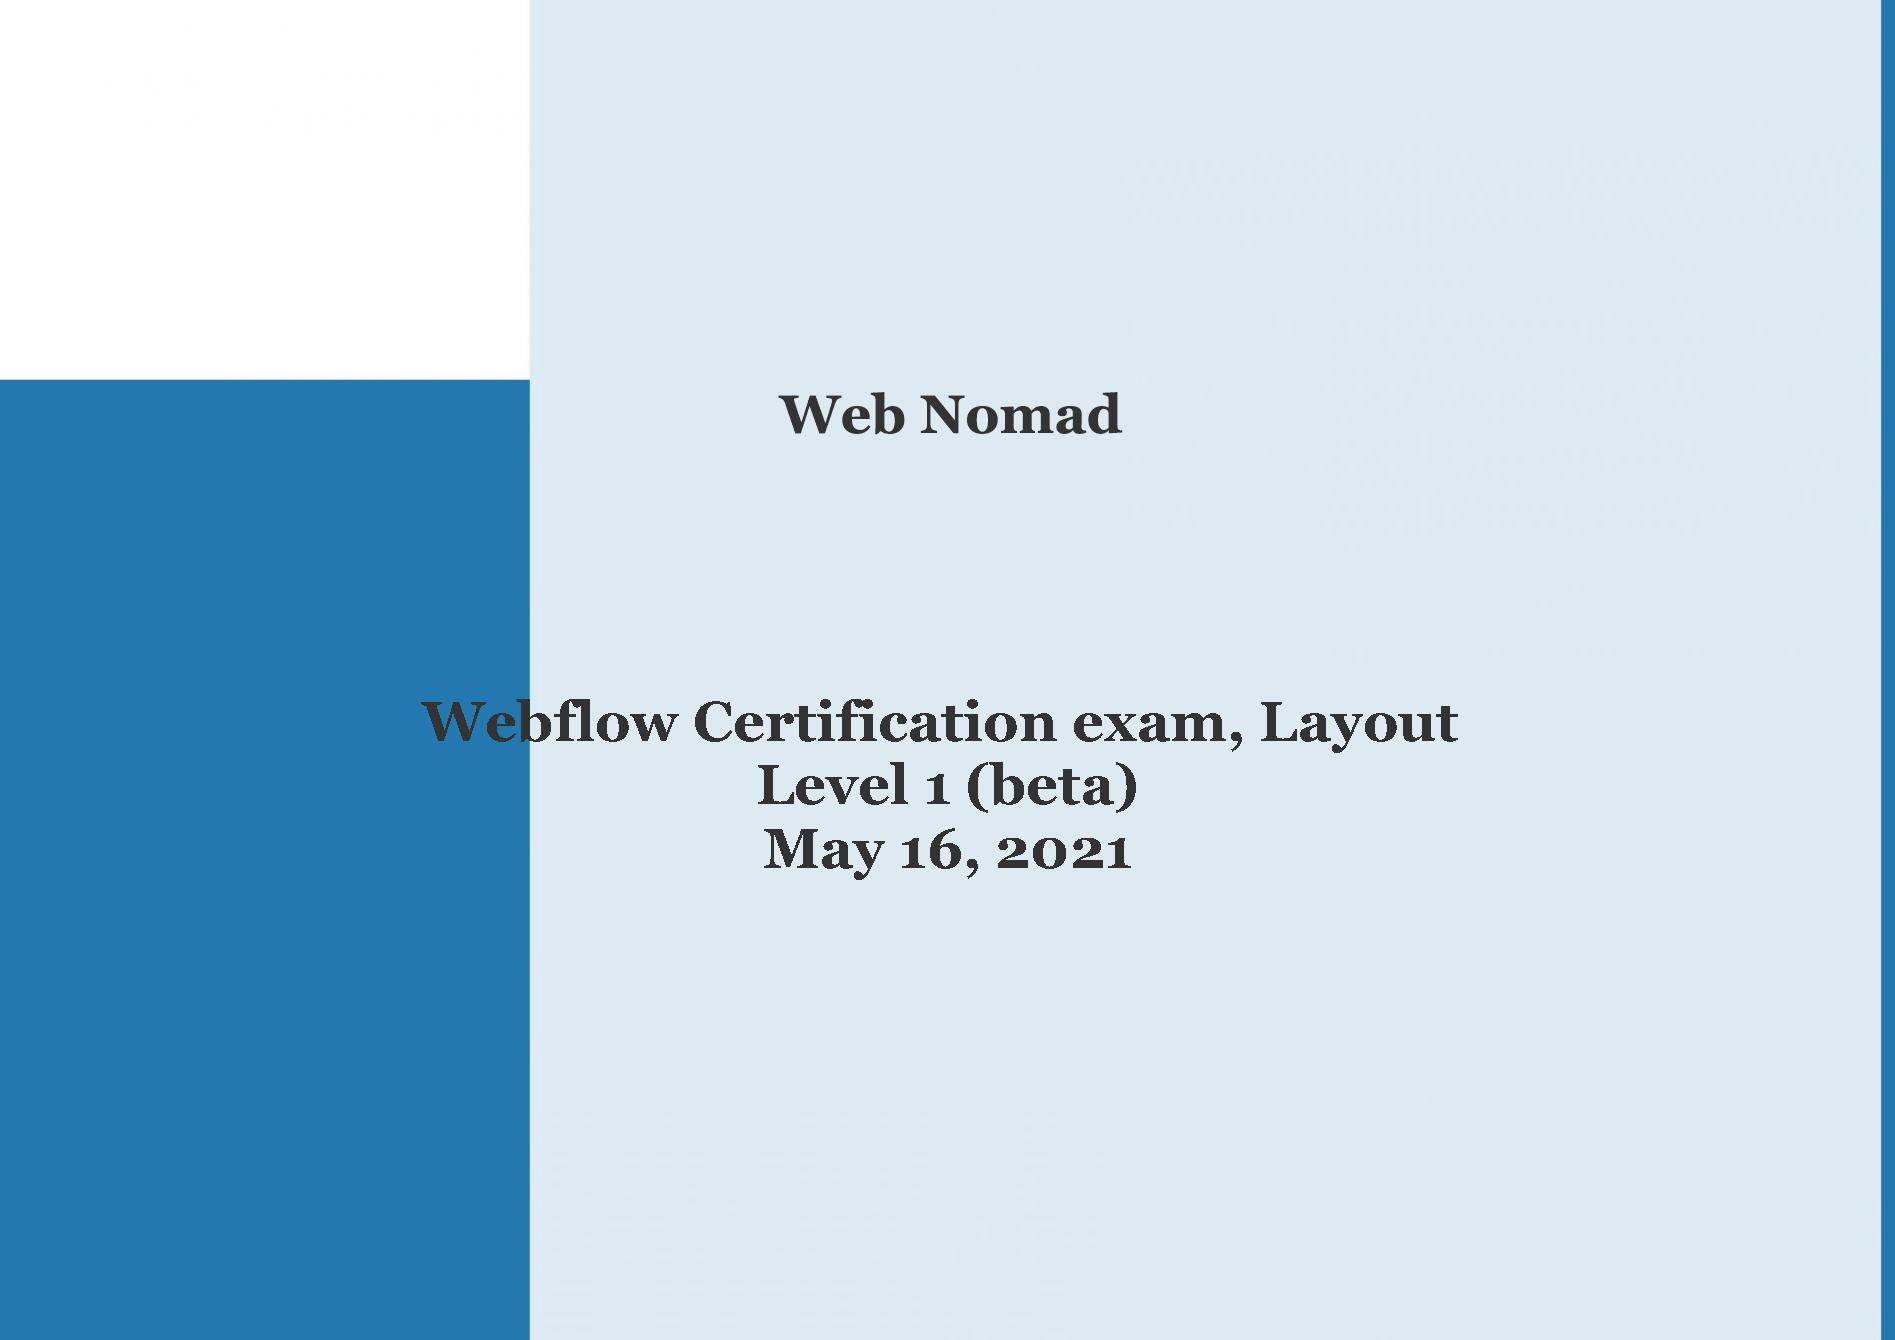 Web Nomad Certification 3